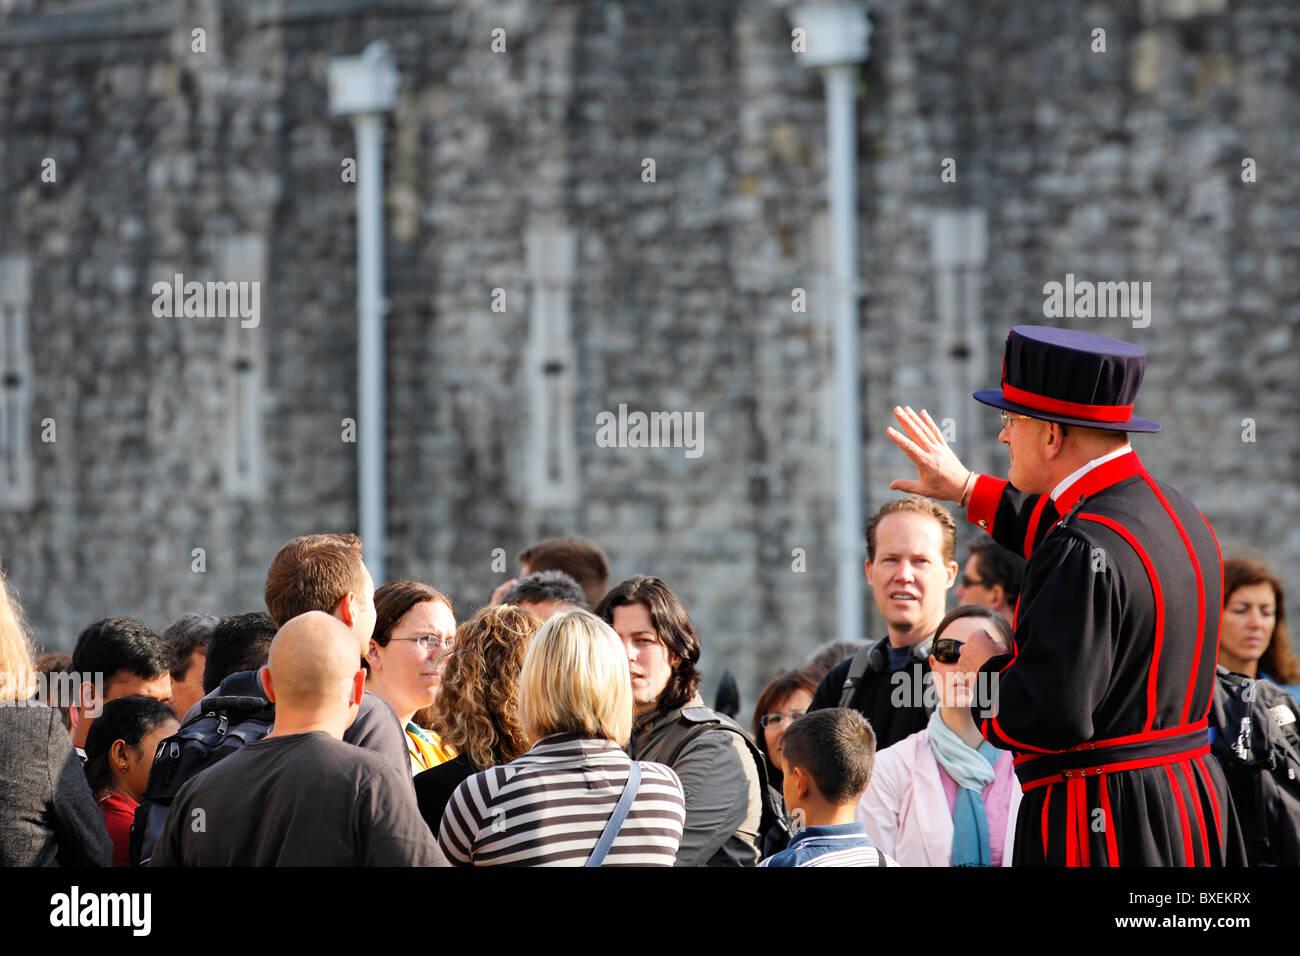 Beefeater mit einer Reisegruppe im Tower of London, UK Stockbild